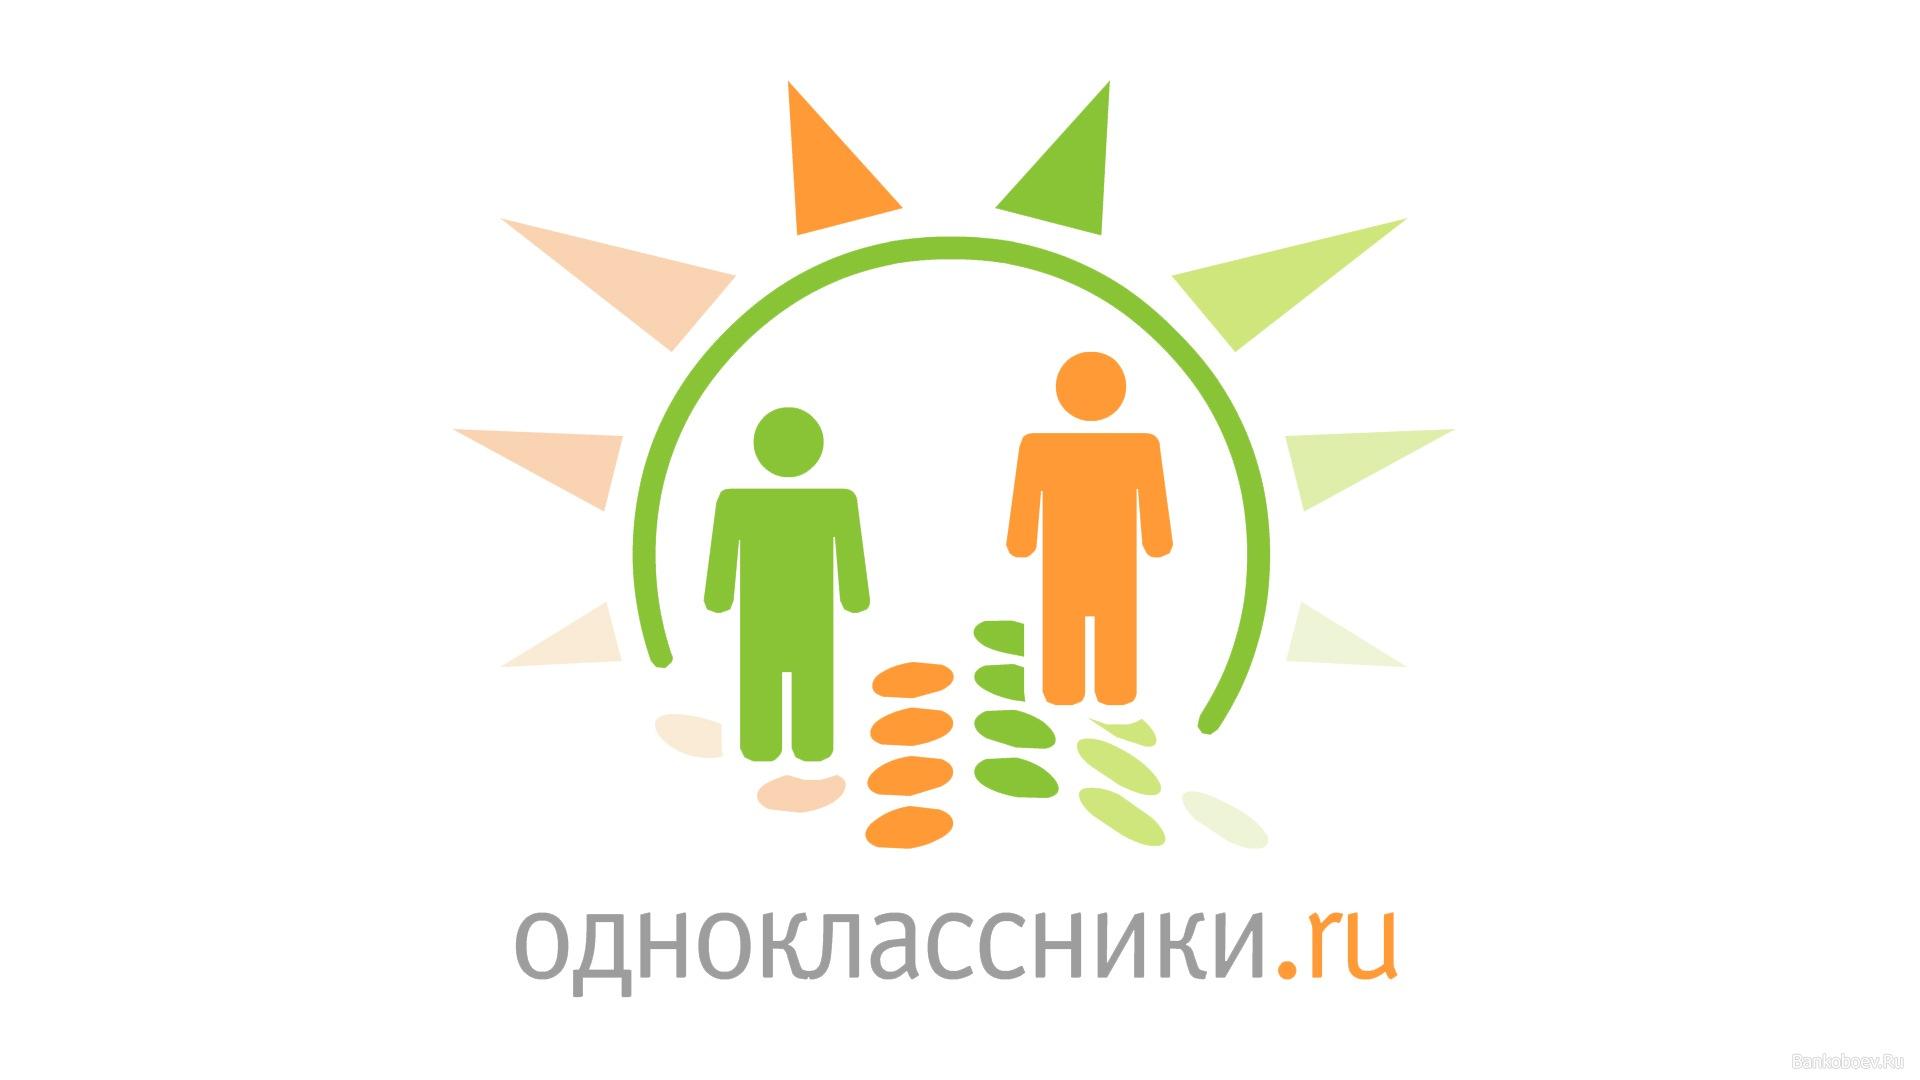 одноклассники фотографии: